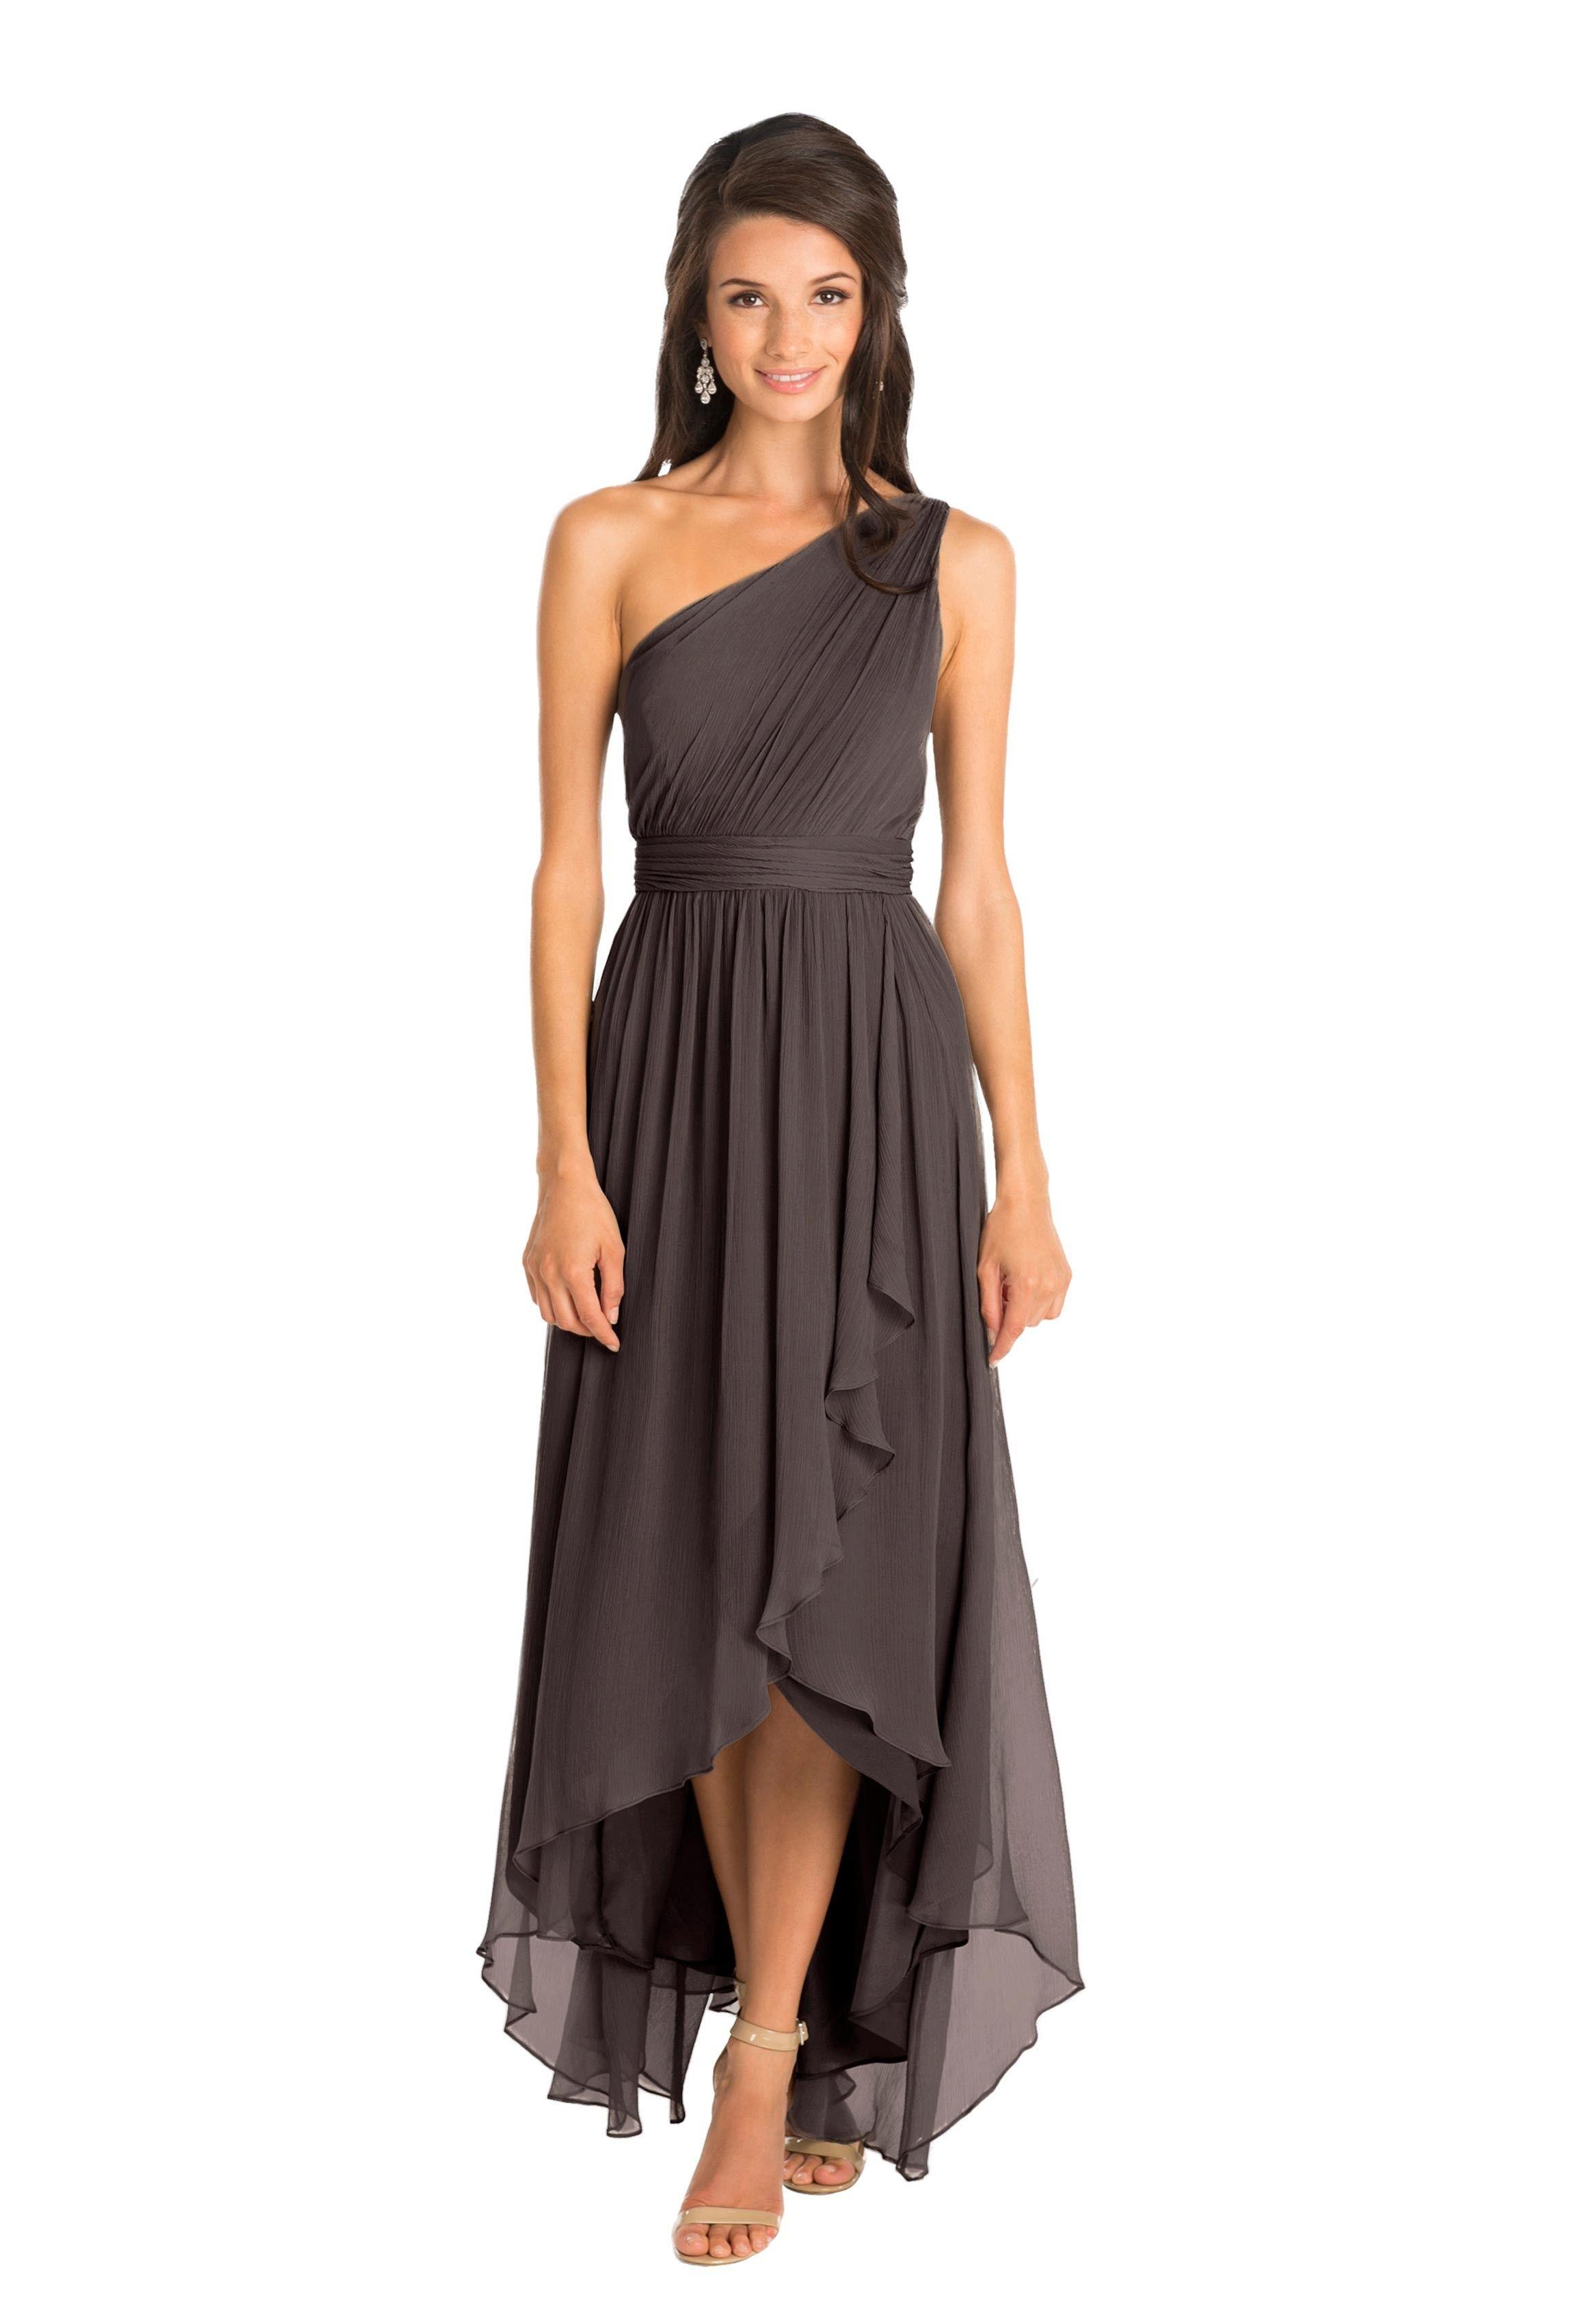 Chiffon oneshoulder bridesmaid dress by Jenny Yoo